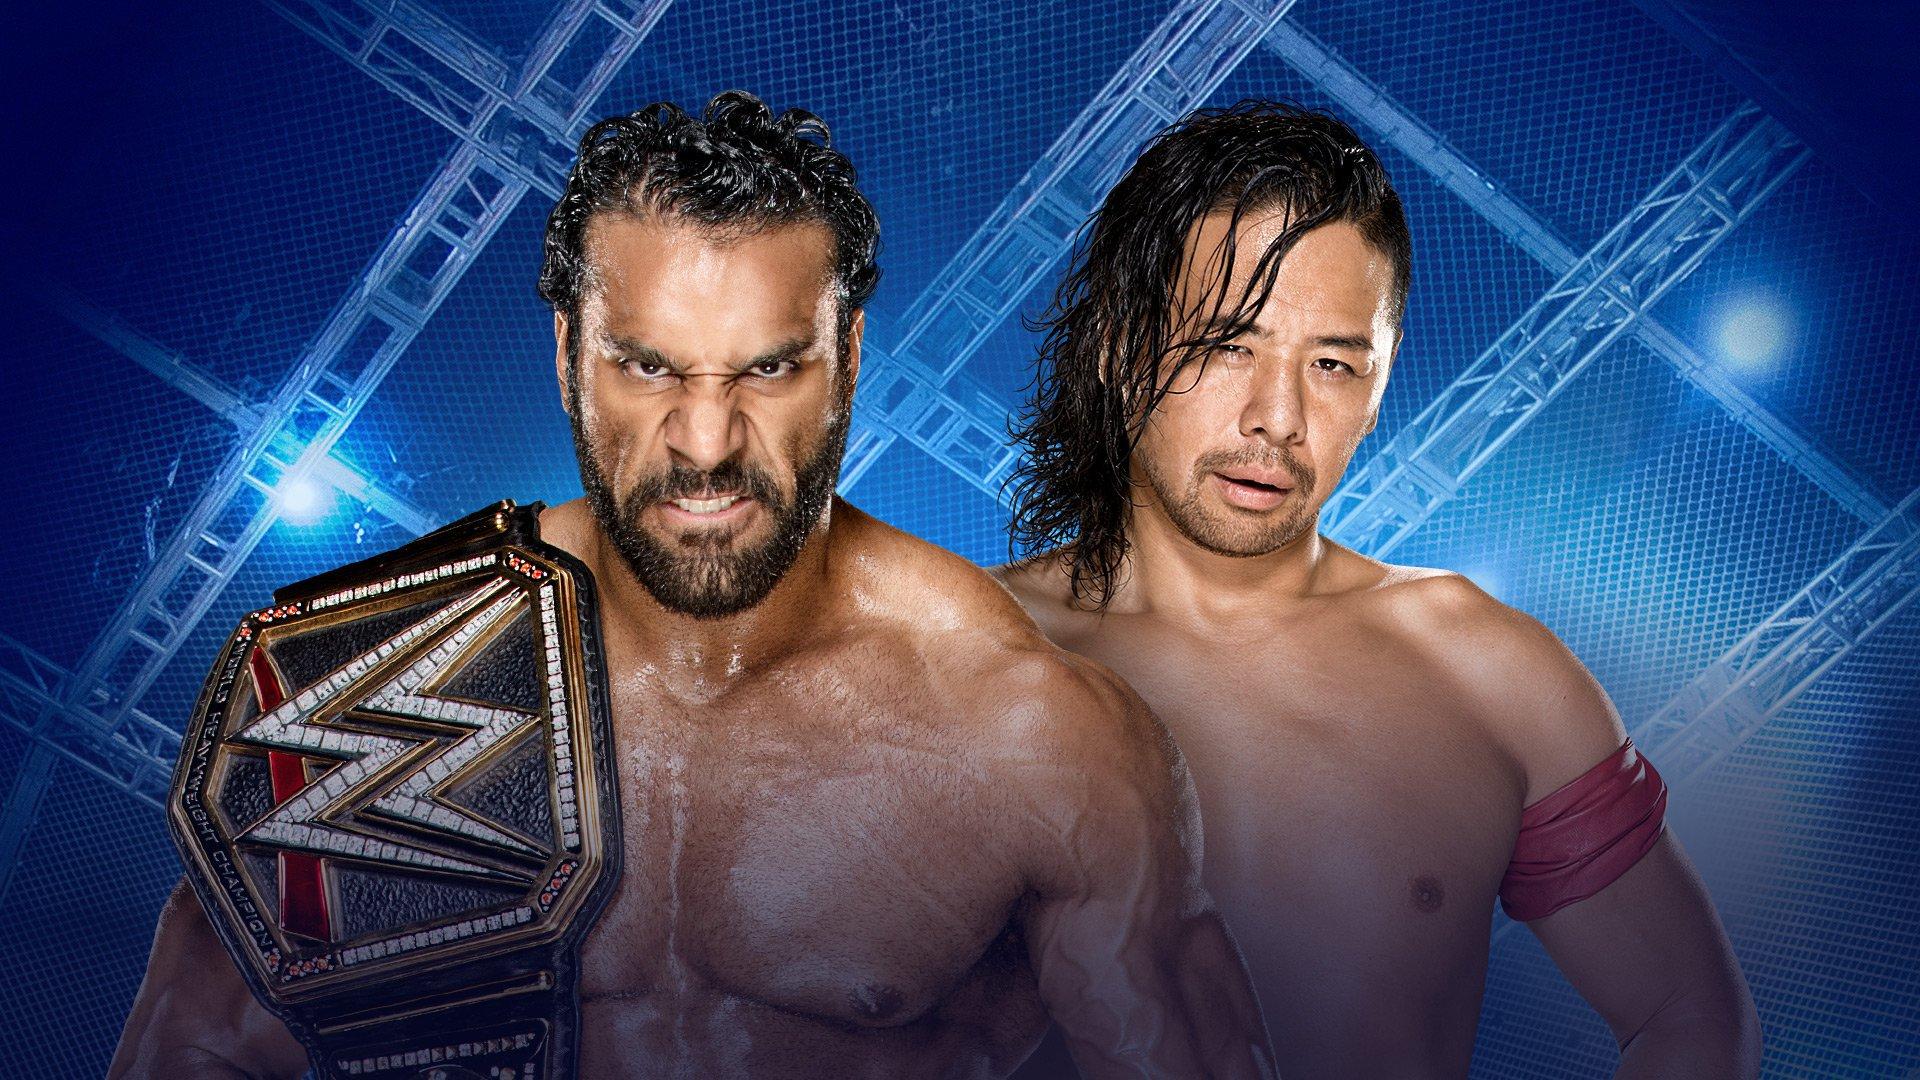 WWE Hell in a Cell 2017: Jinder Mahal vs. Shinsuke Nakamura